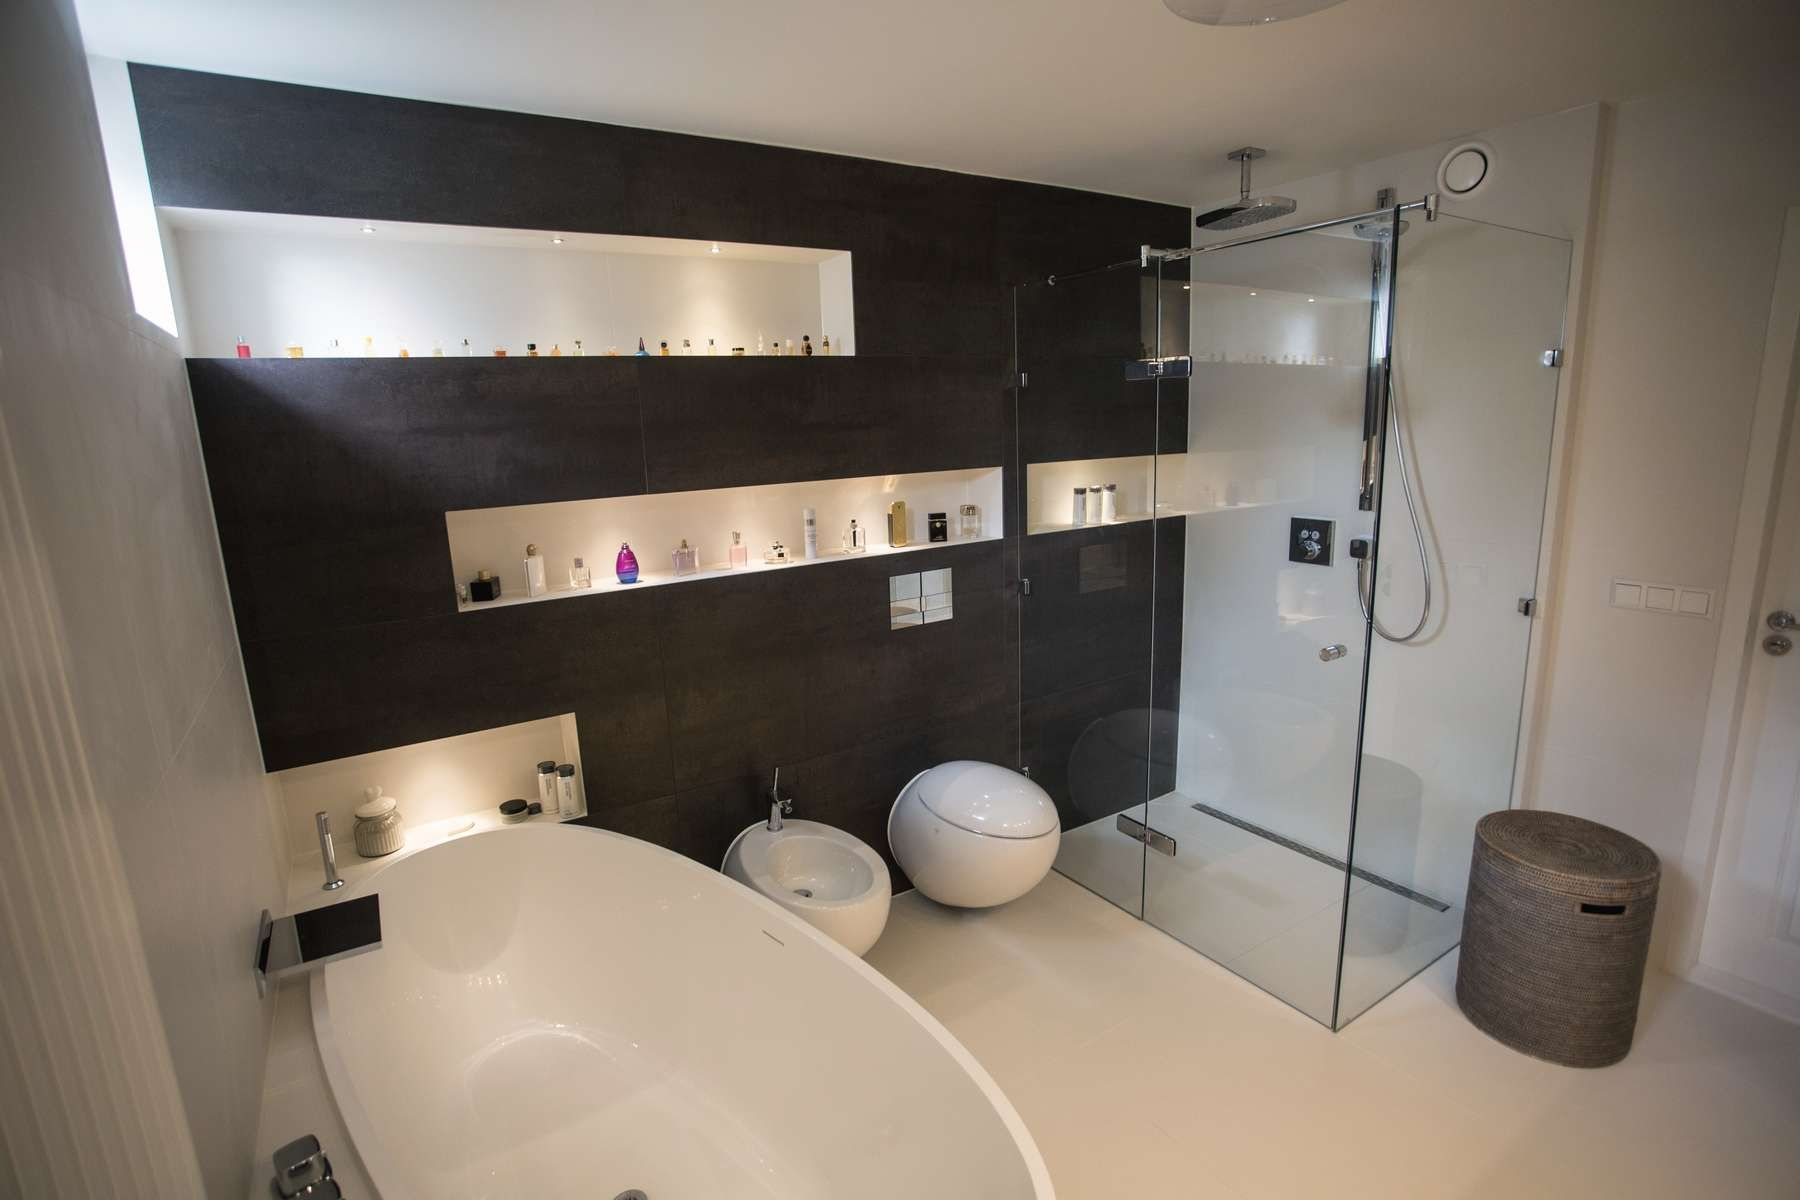 Sfeervolle Badkamer Ideeen : Badkamer bilthoven badkamershowroom de eerste kamer badkamers